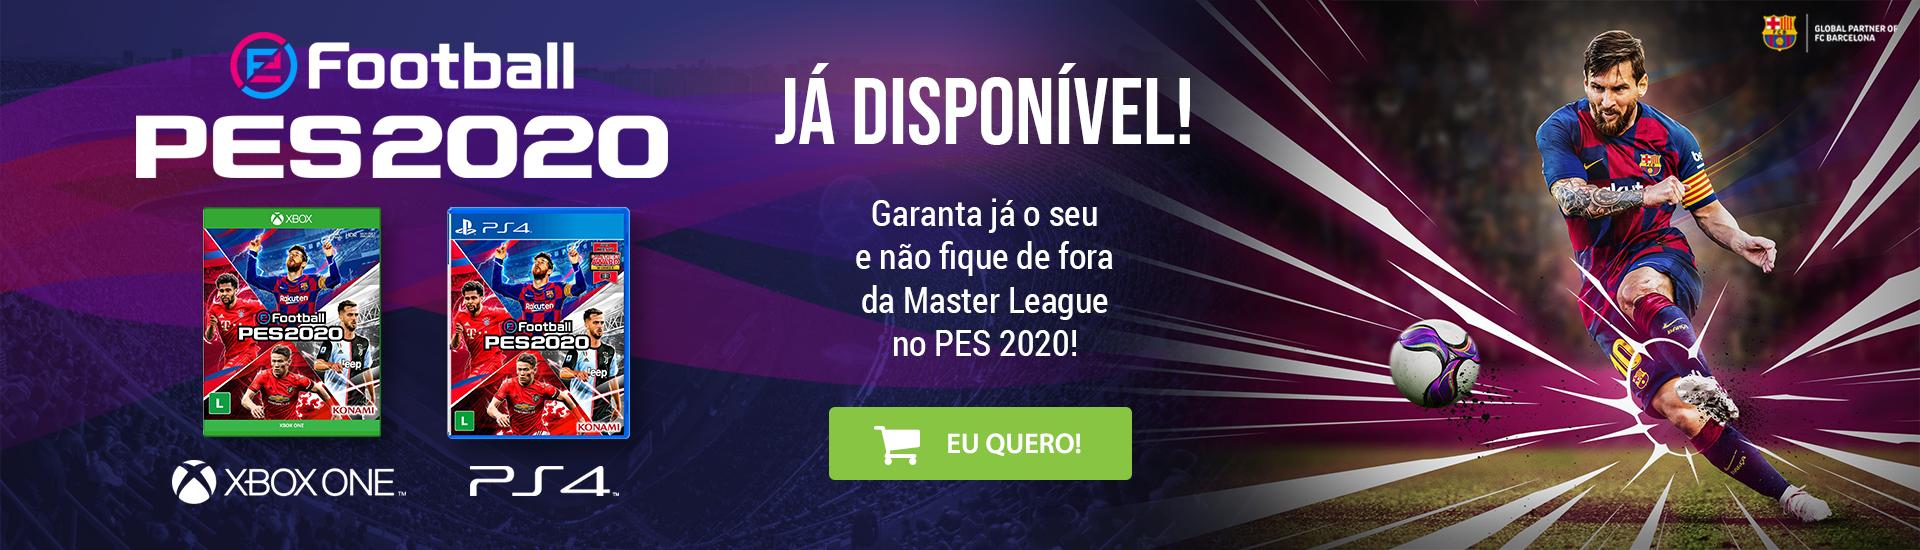 banner pes 2020 disponivel